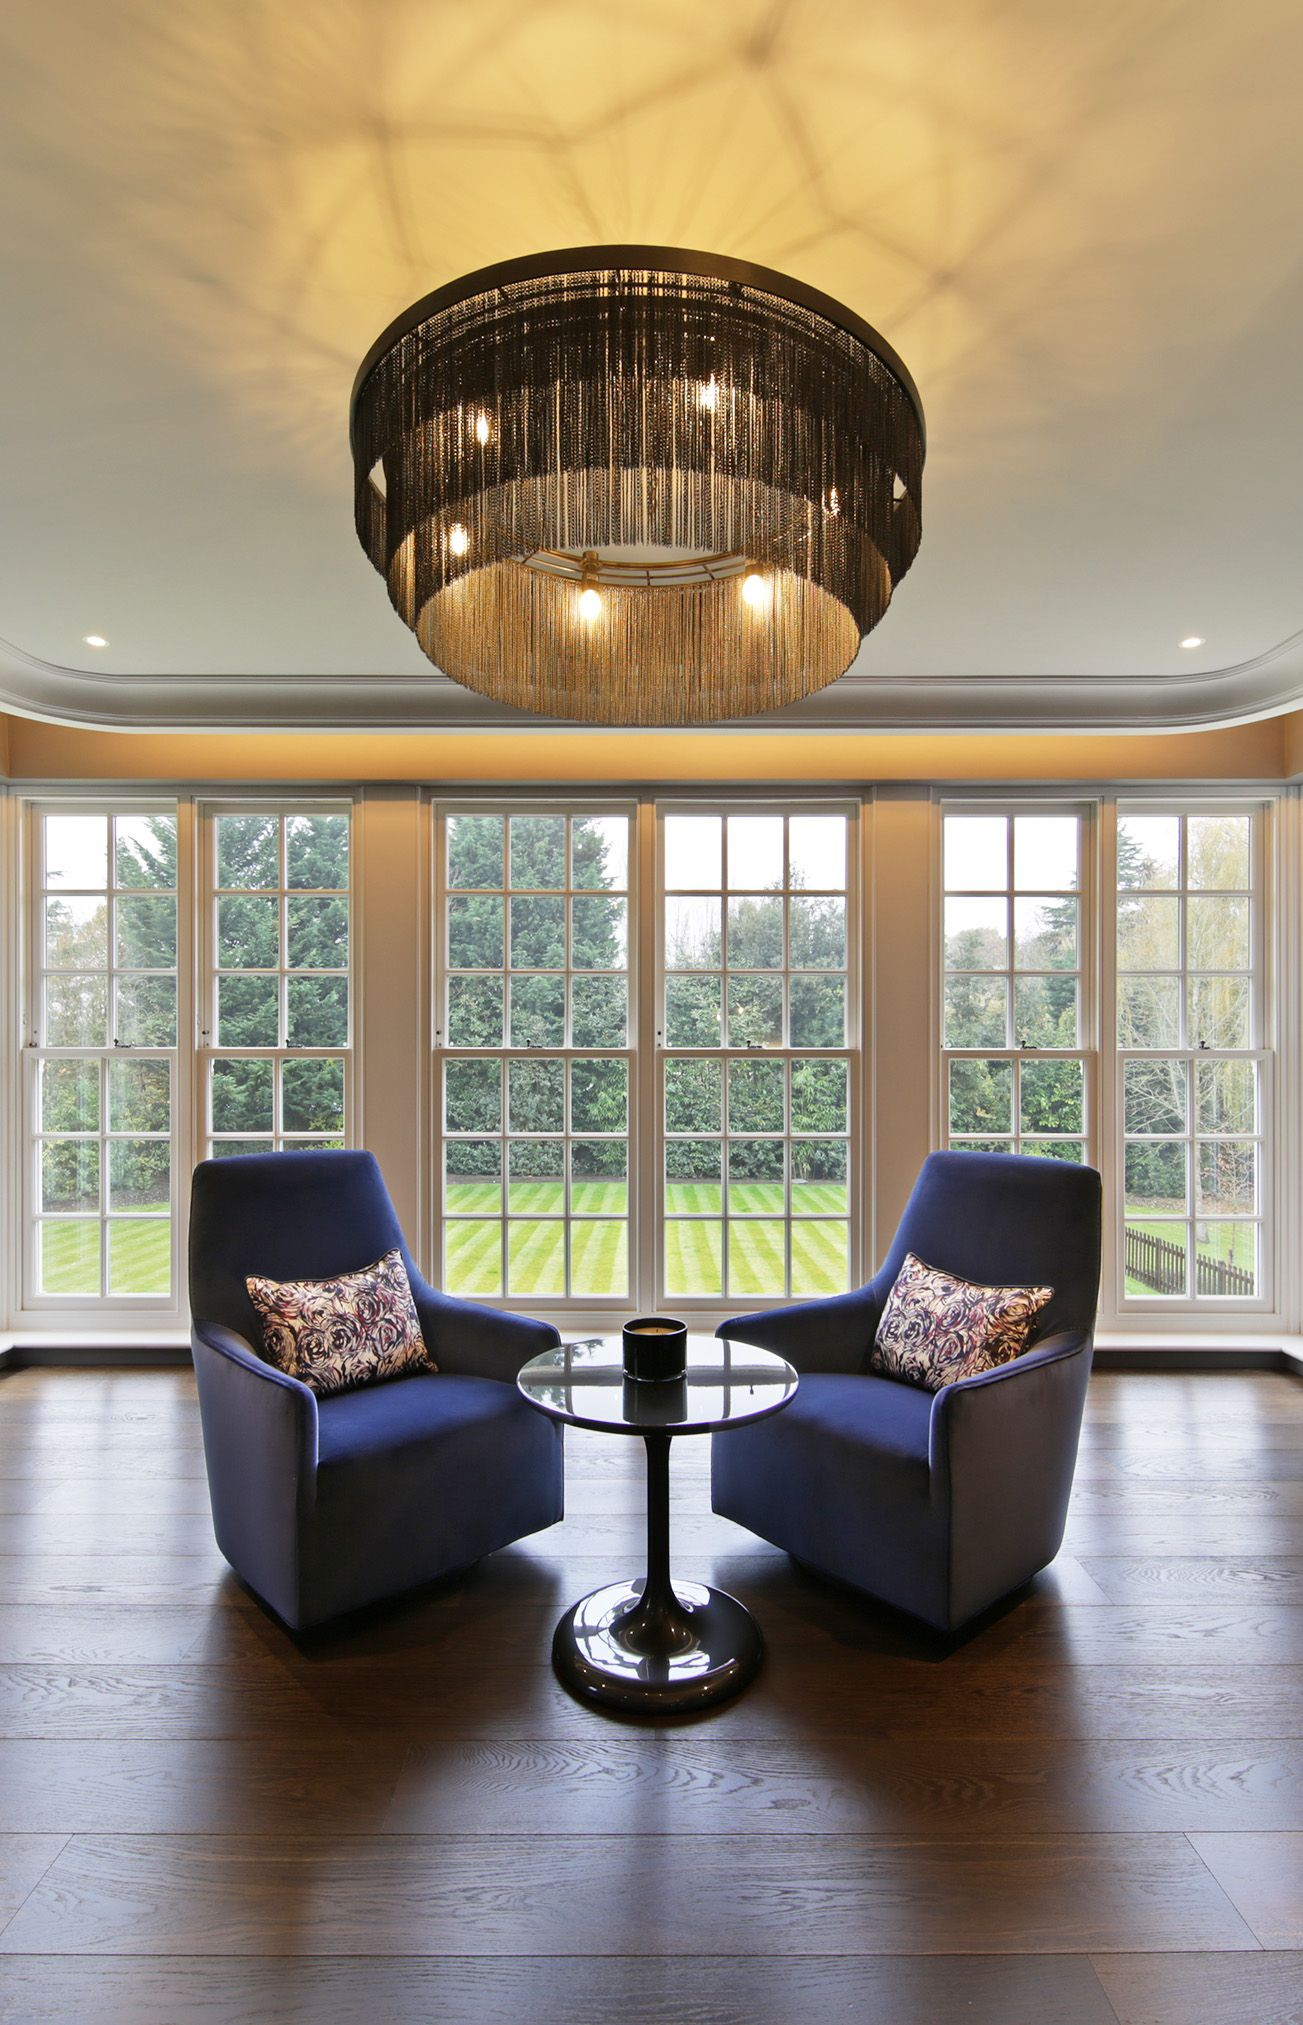 Beverley Barnett Interior Designer Employs Modern Contemporary